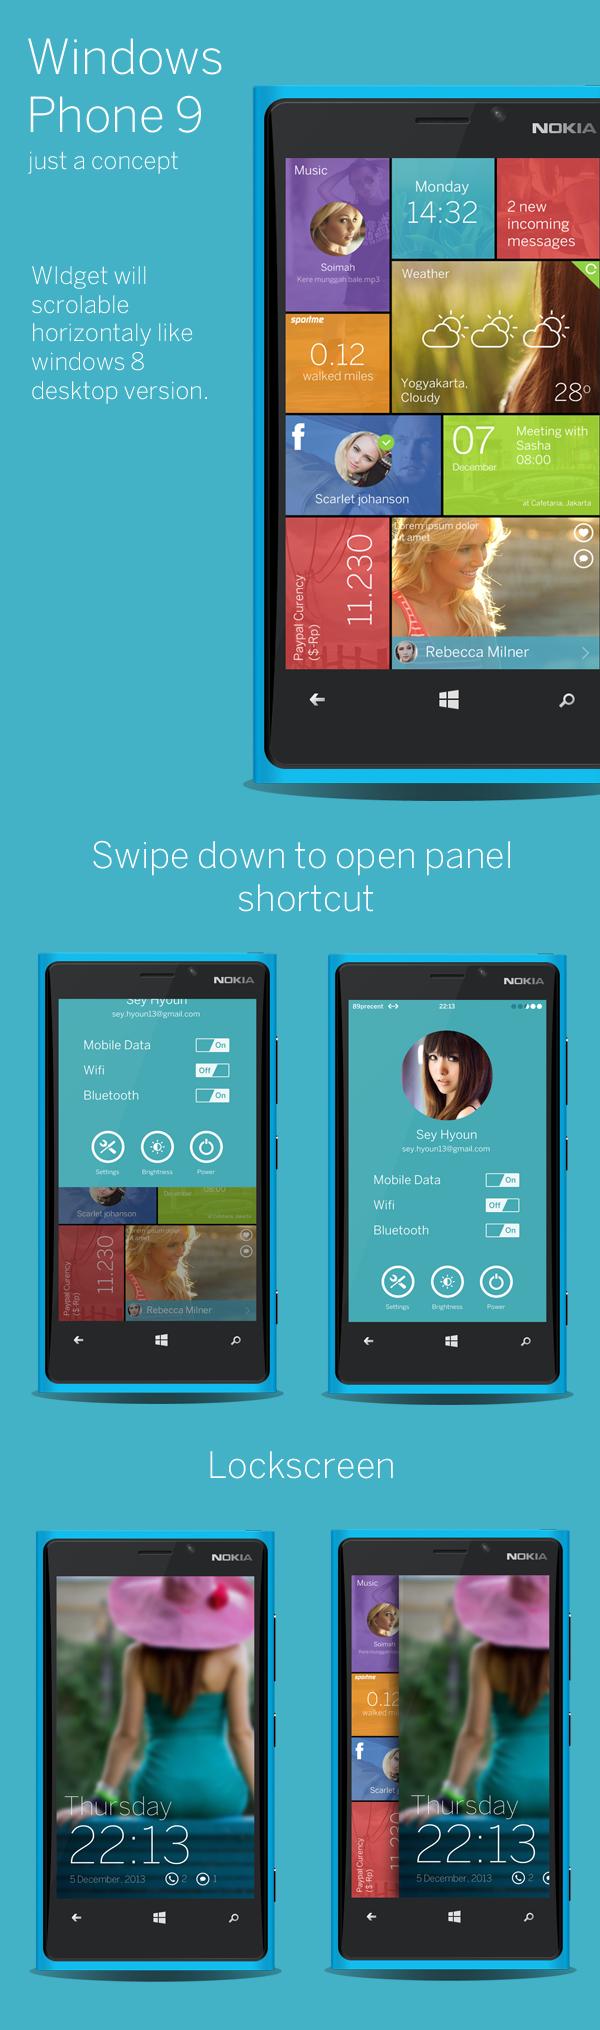 WindowsPhone9UIConcept2